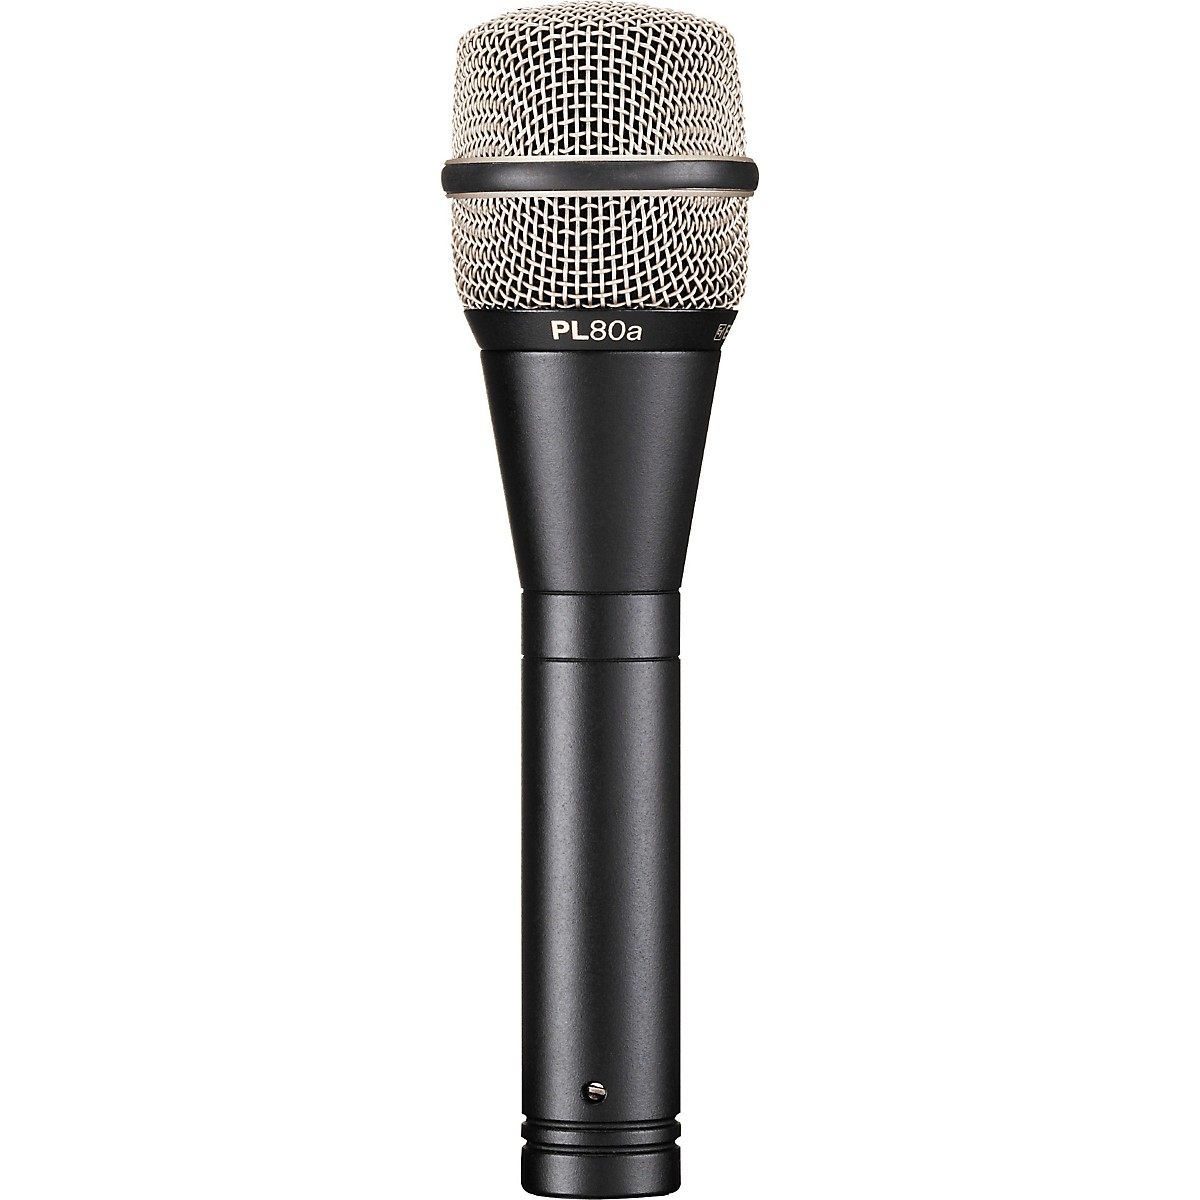 Electro-Voice PL80 Dynamic Microphone